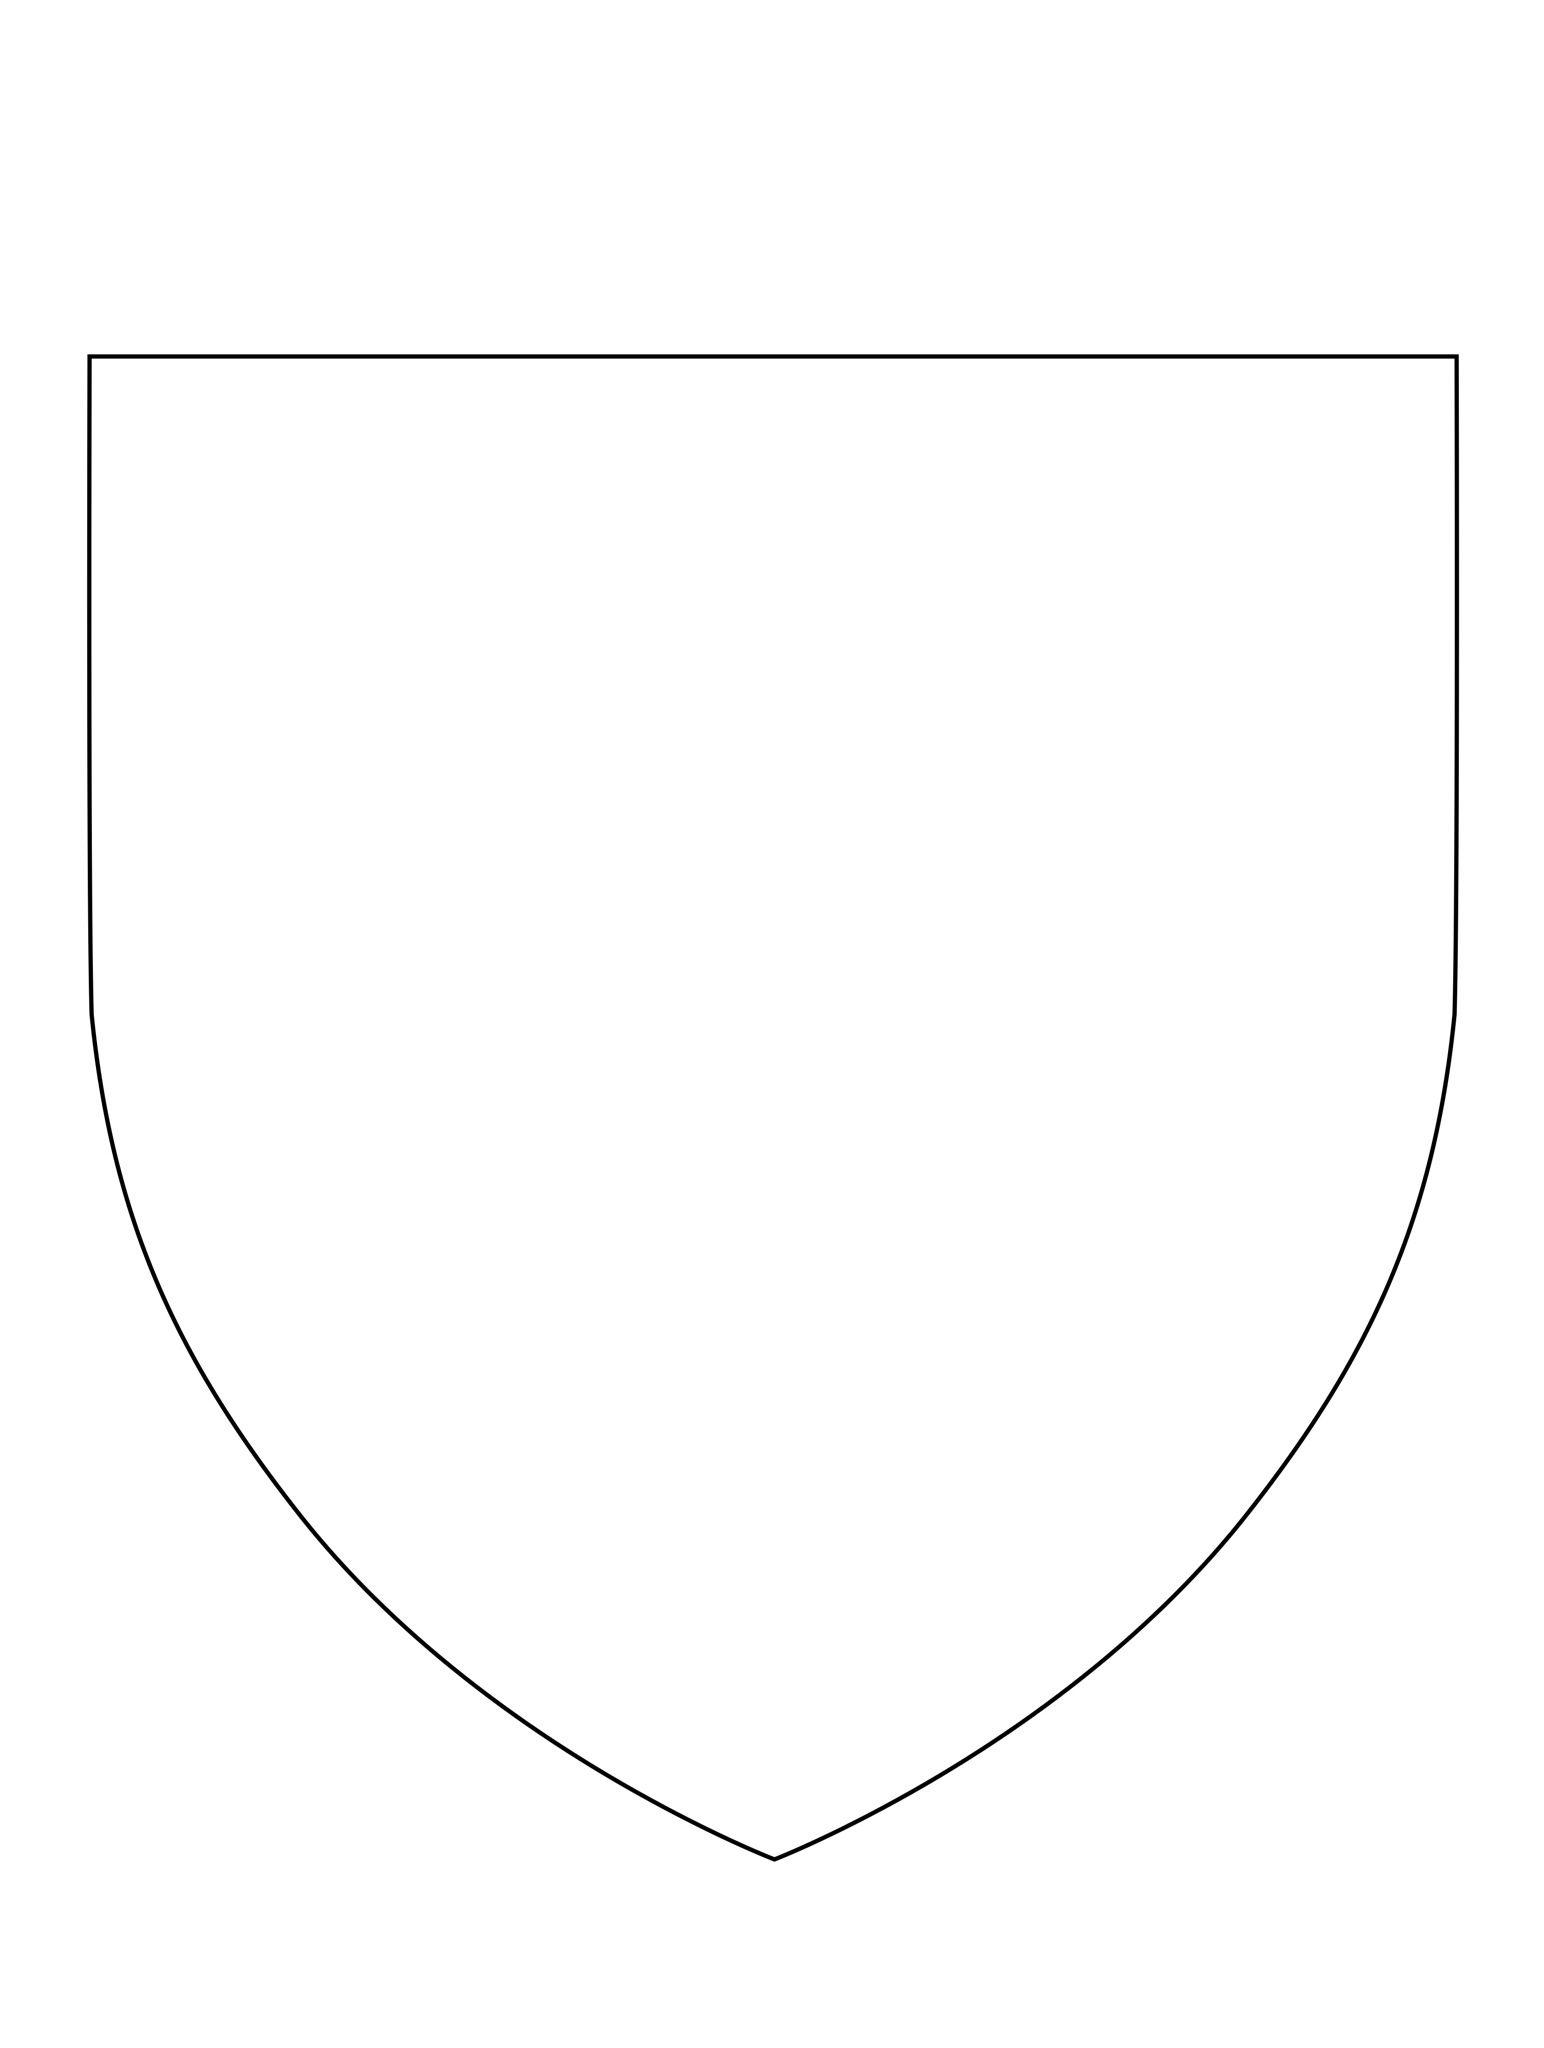 Heraldic Shield Blank